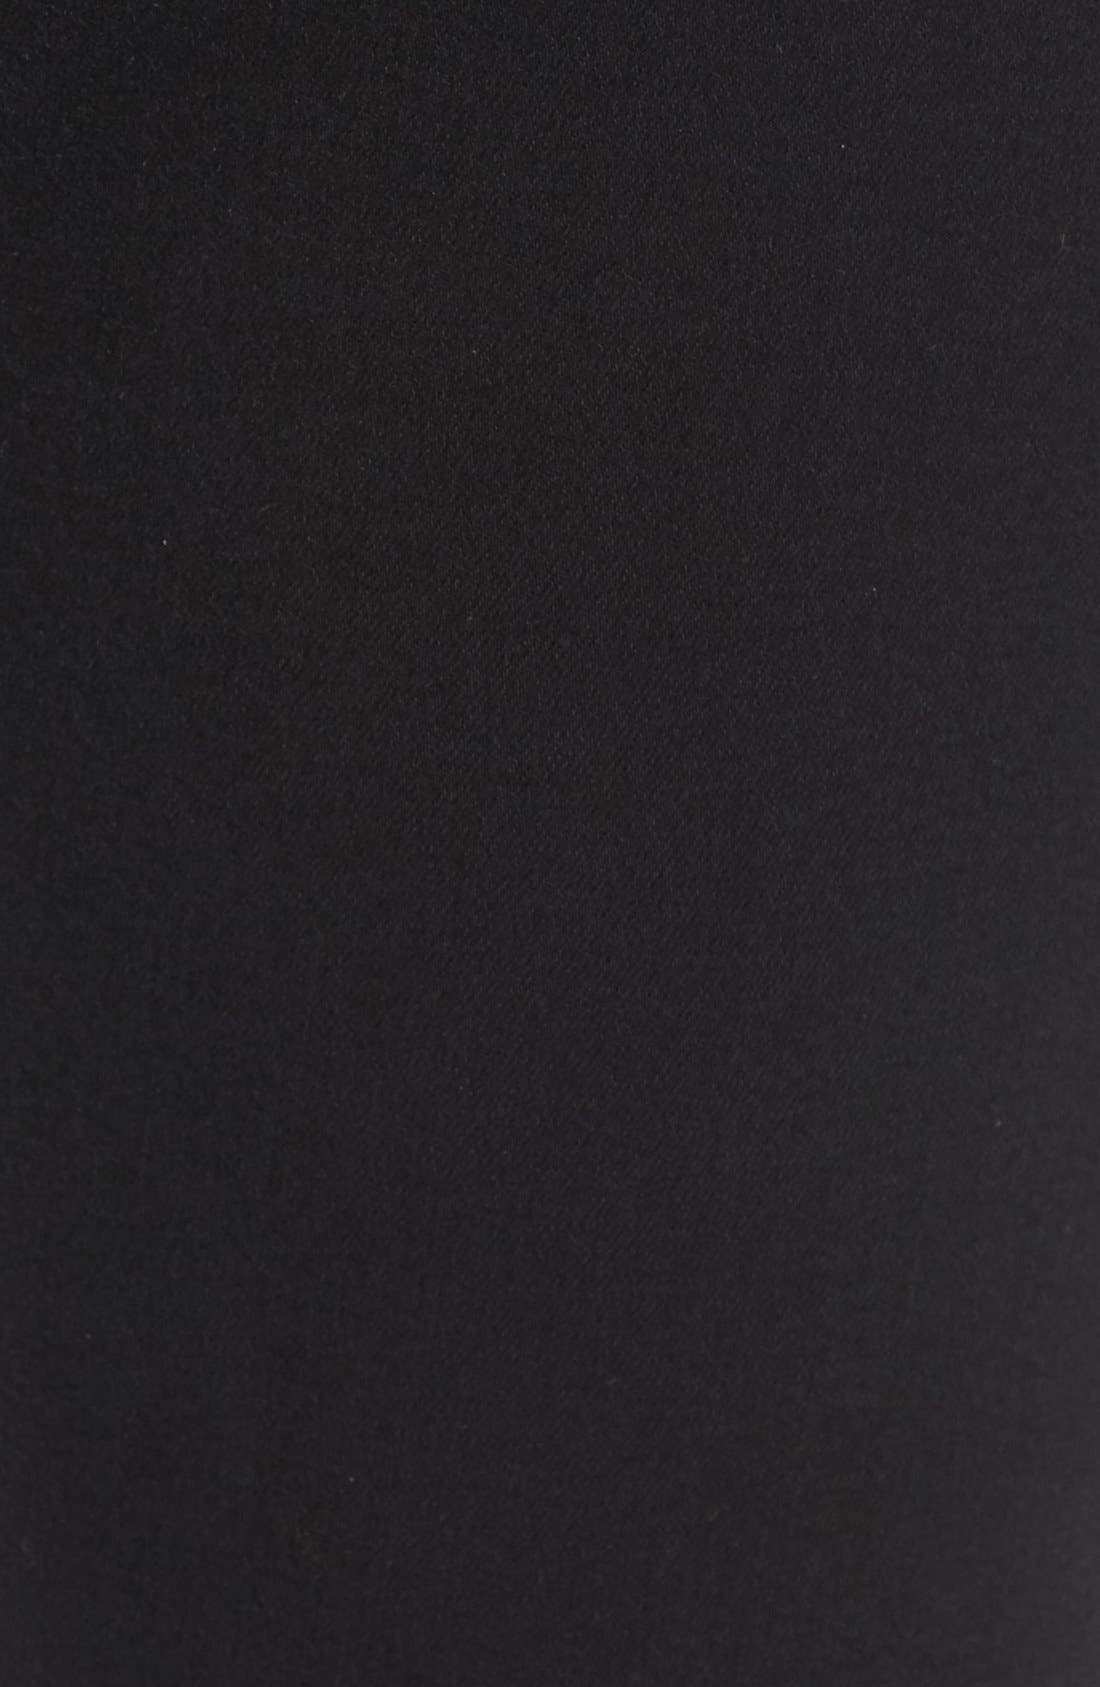 Tuxedo Stripe Skinny Jeans,                             Alternate thumbnail 5, color,                             Riche Touch Black Noir